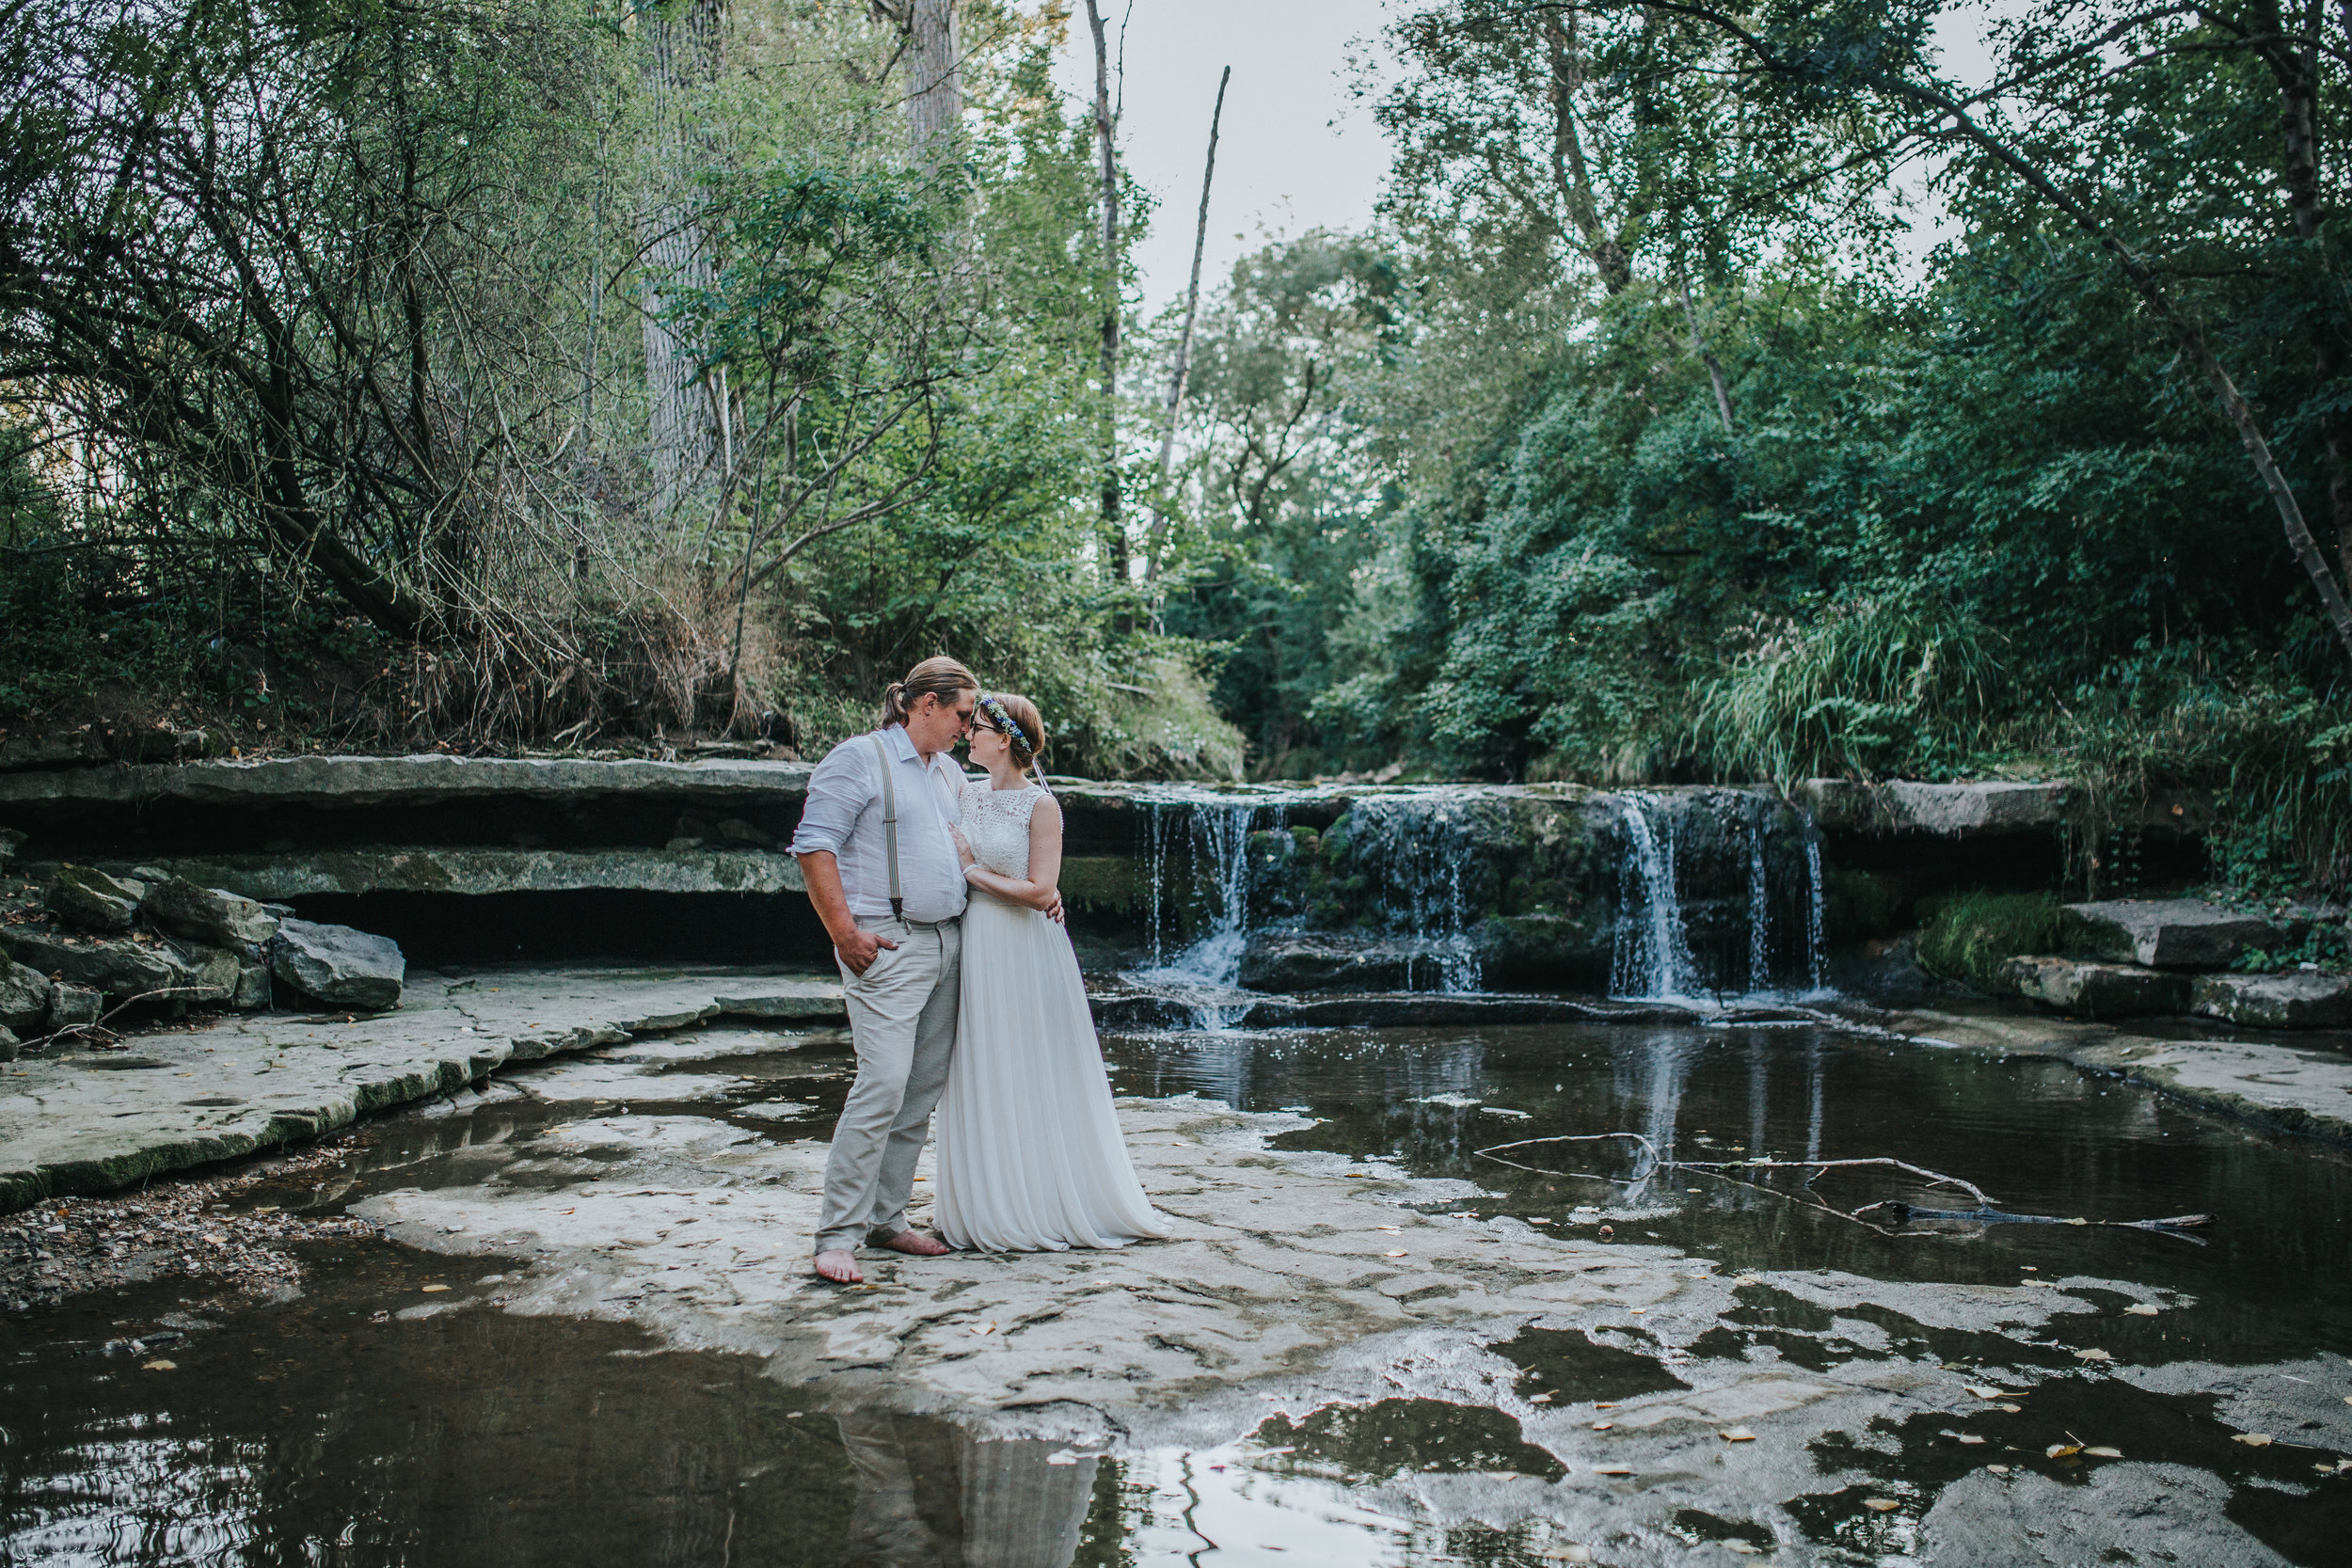 yessica-baur-fotografie-after-wedding-tübingen-102-1041.JPG